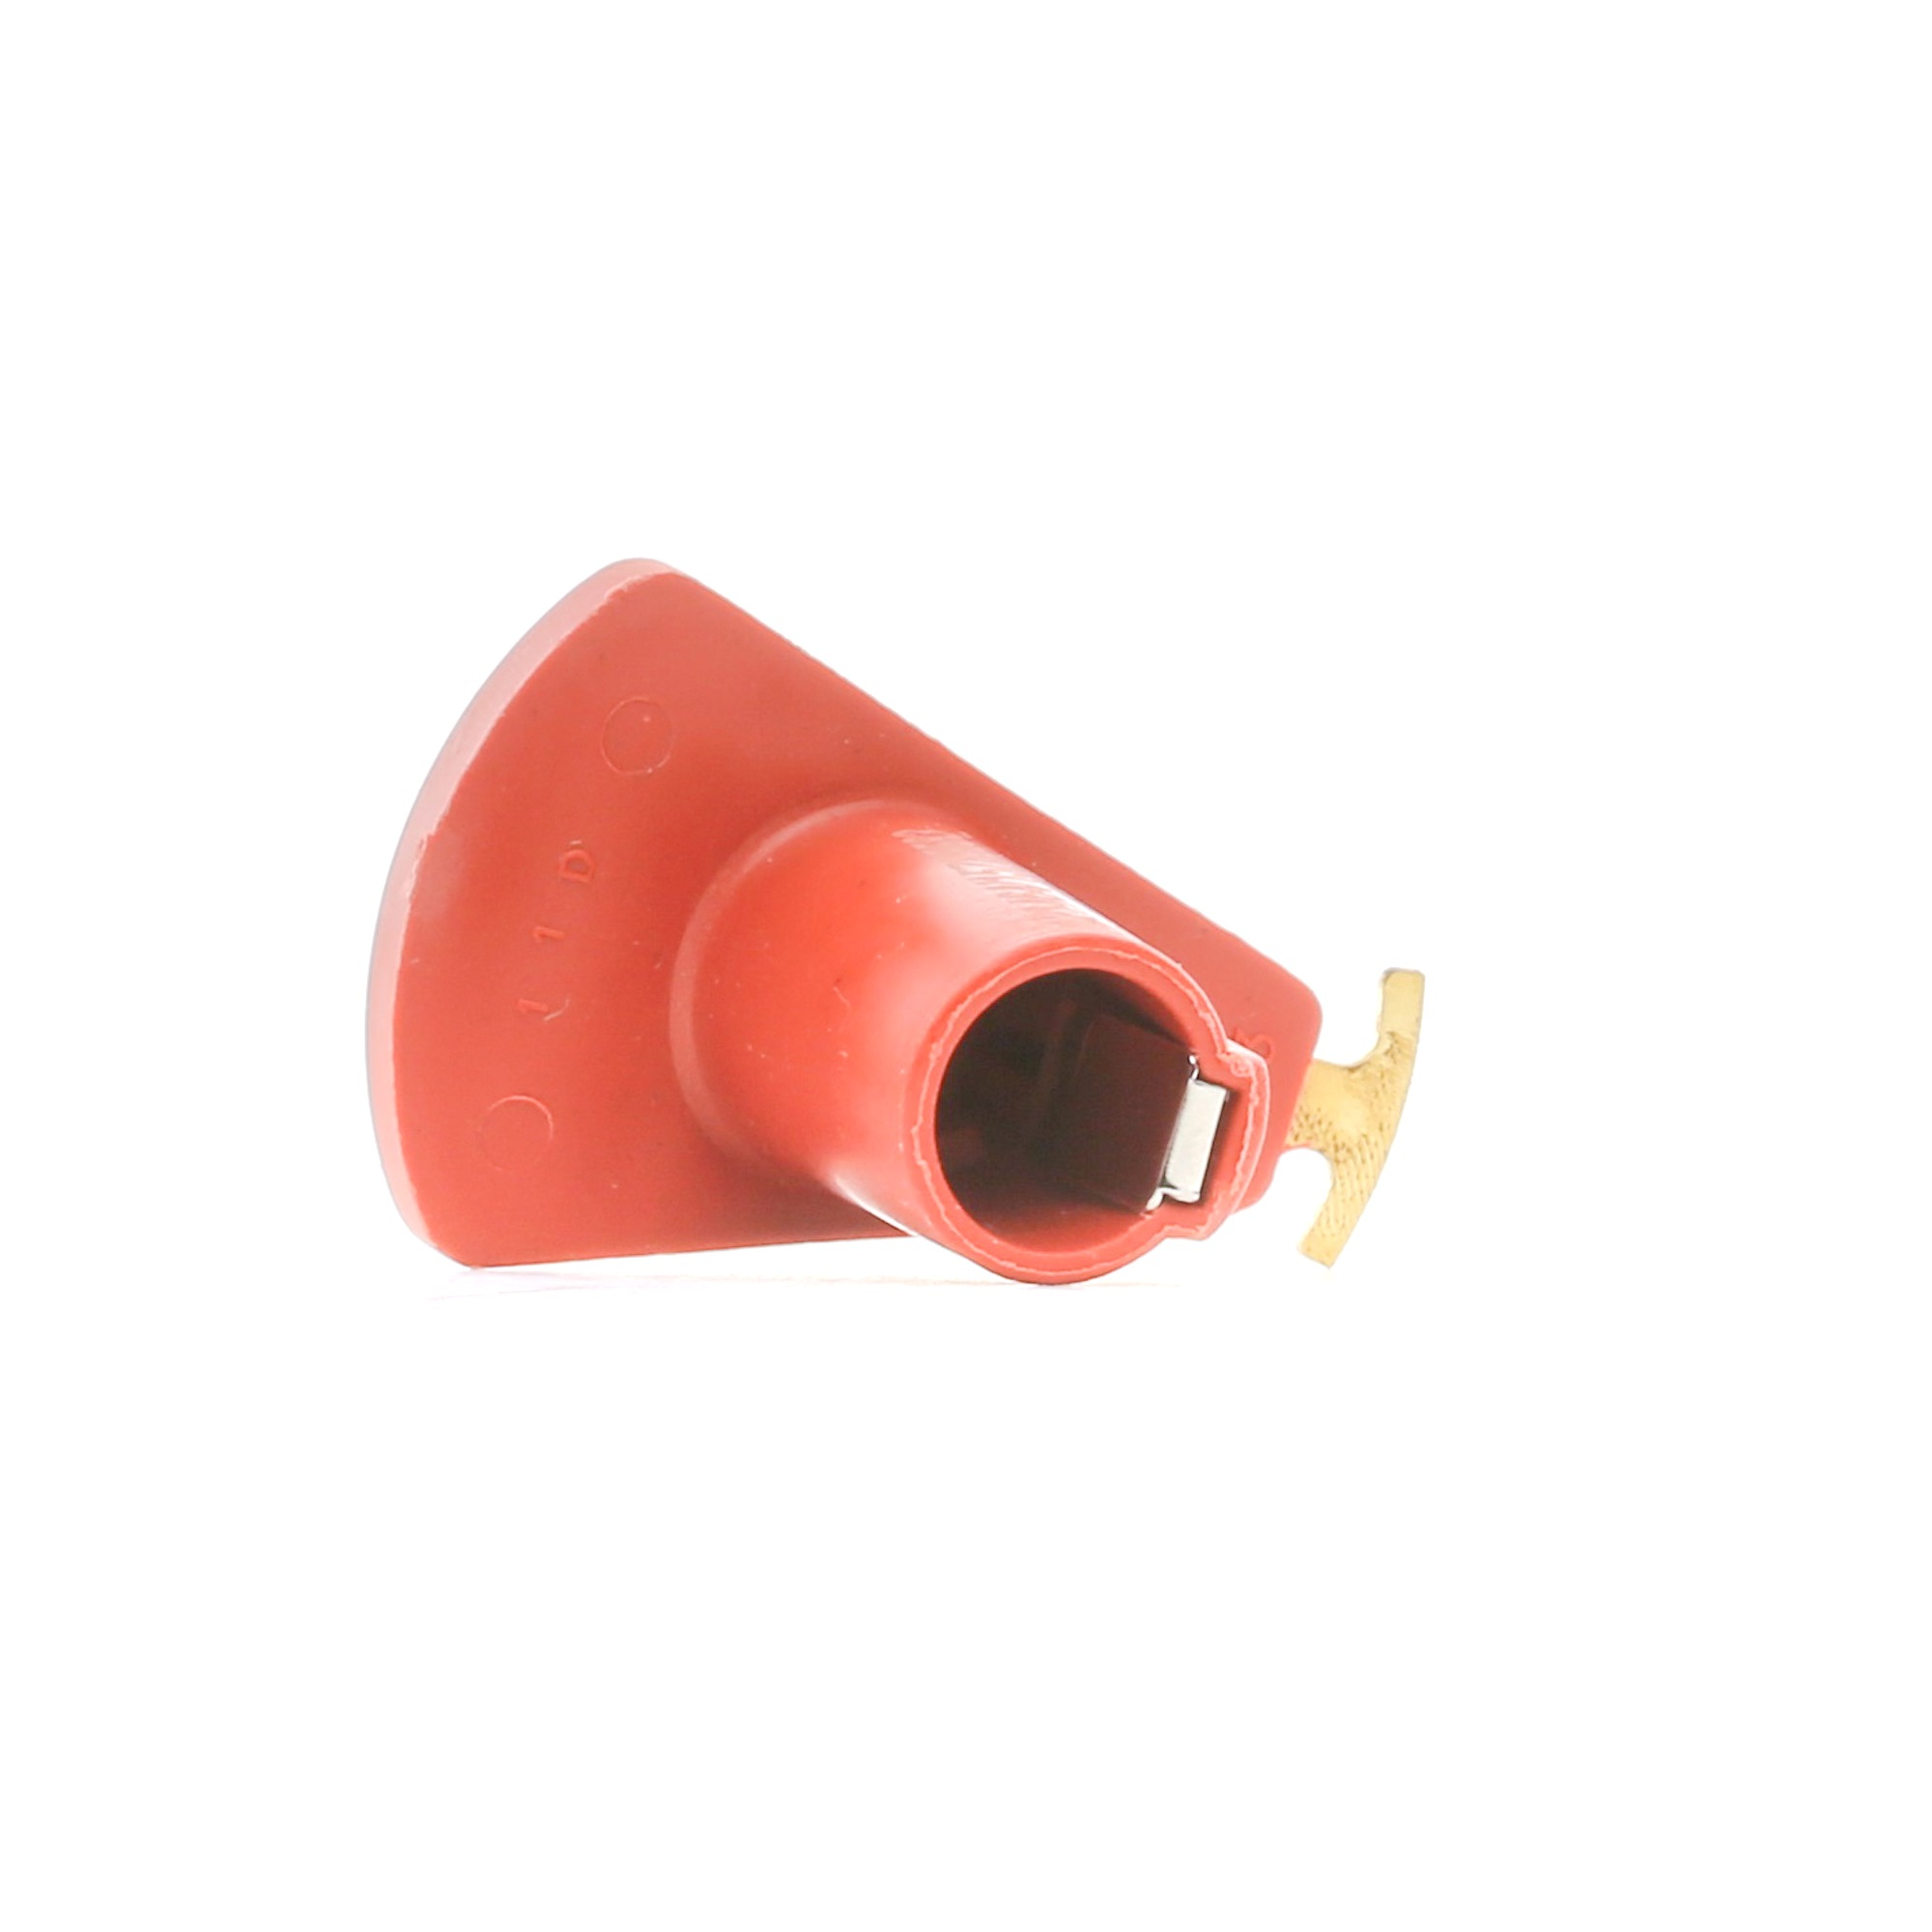 Zündverteilerfinger STARK SKROD-1790019